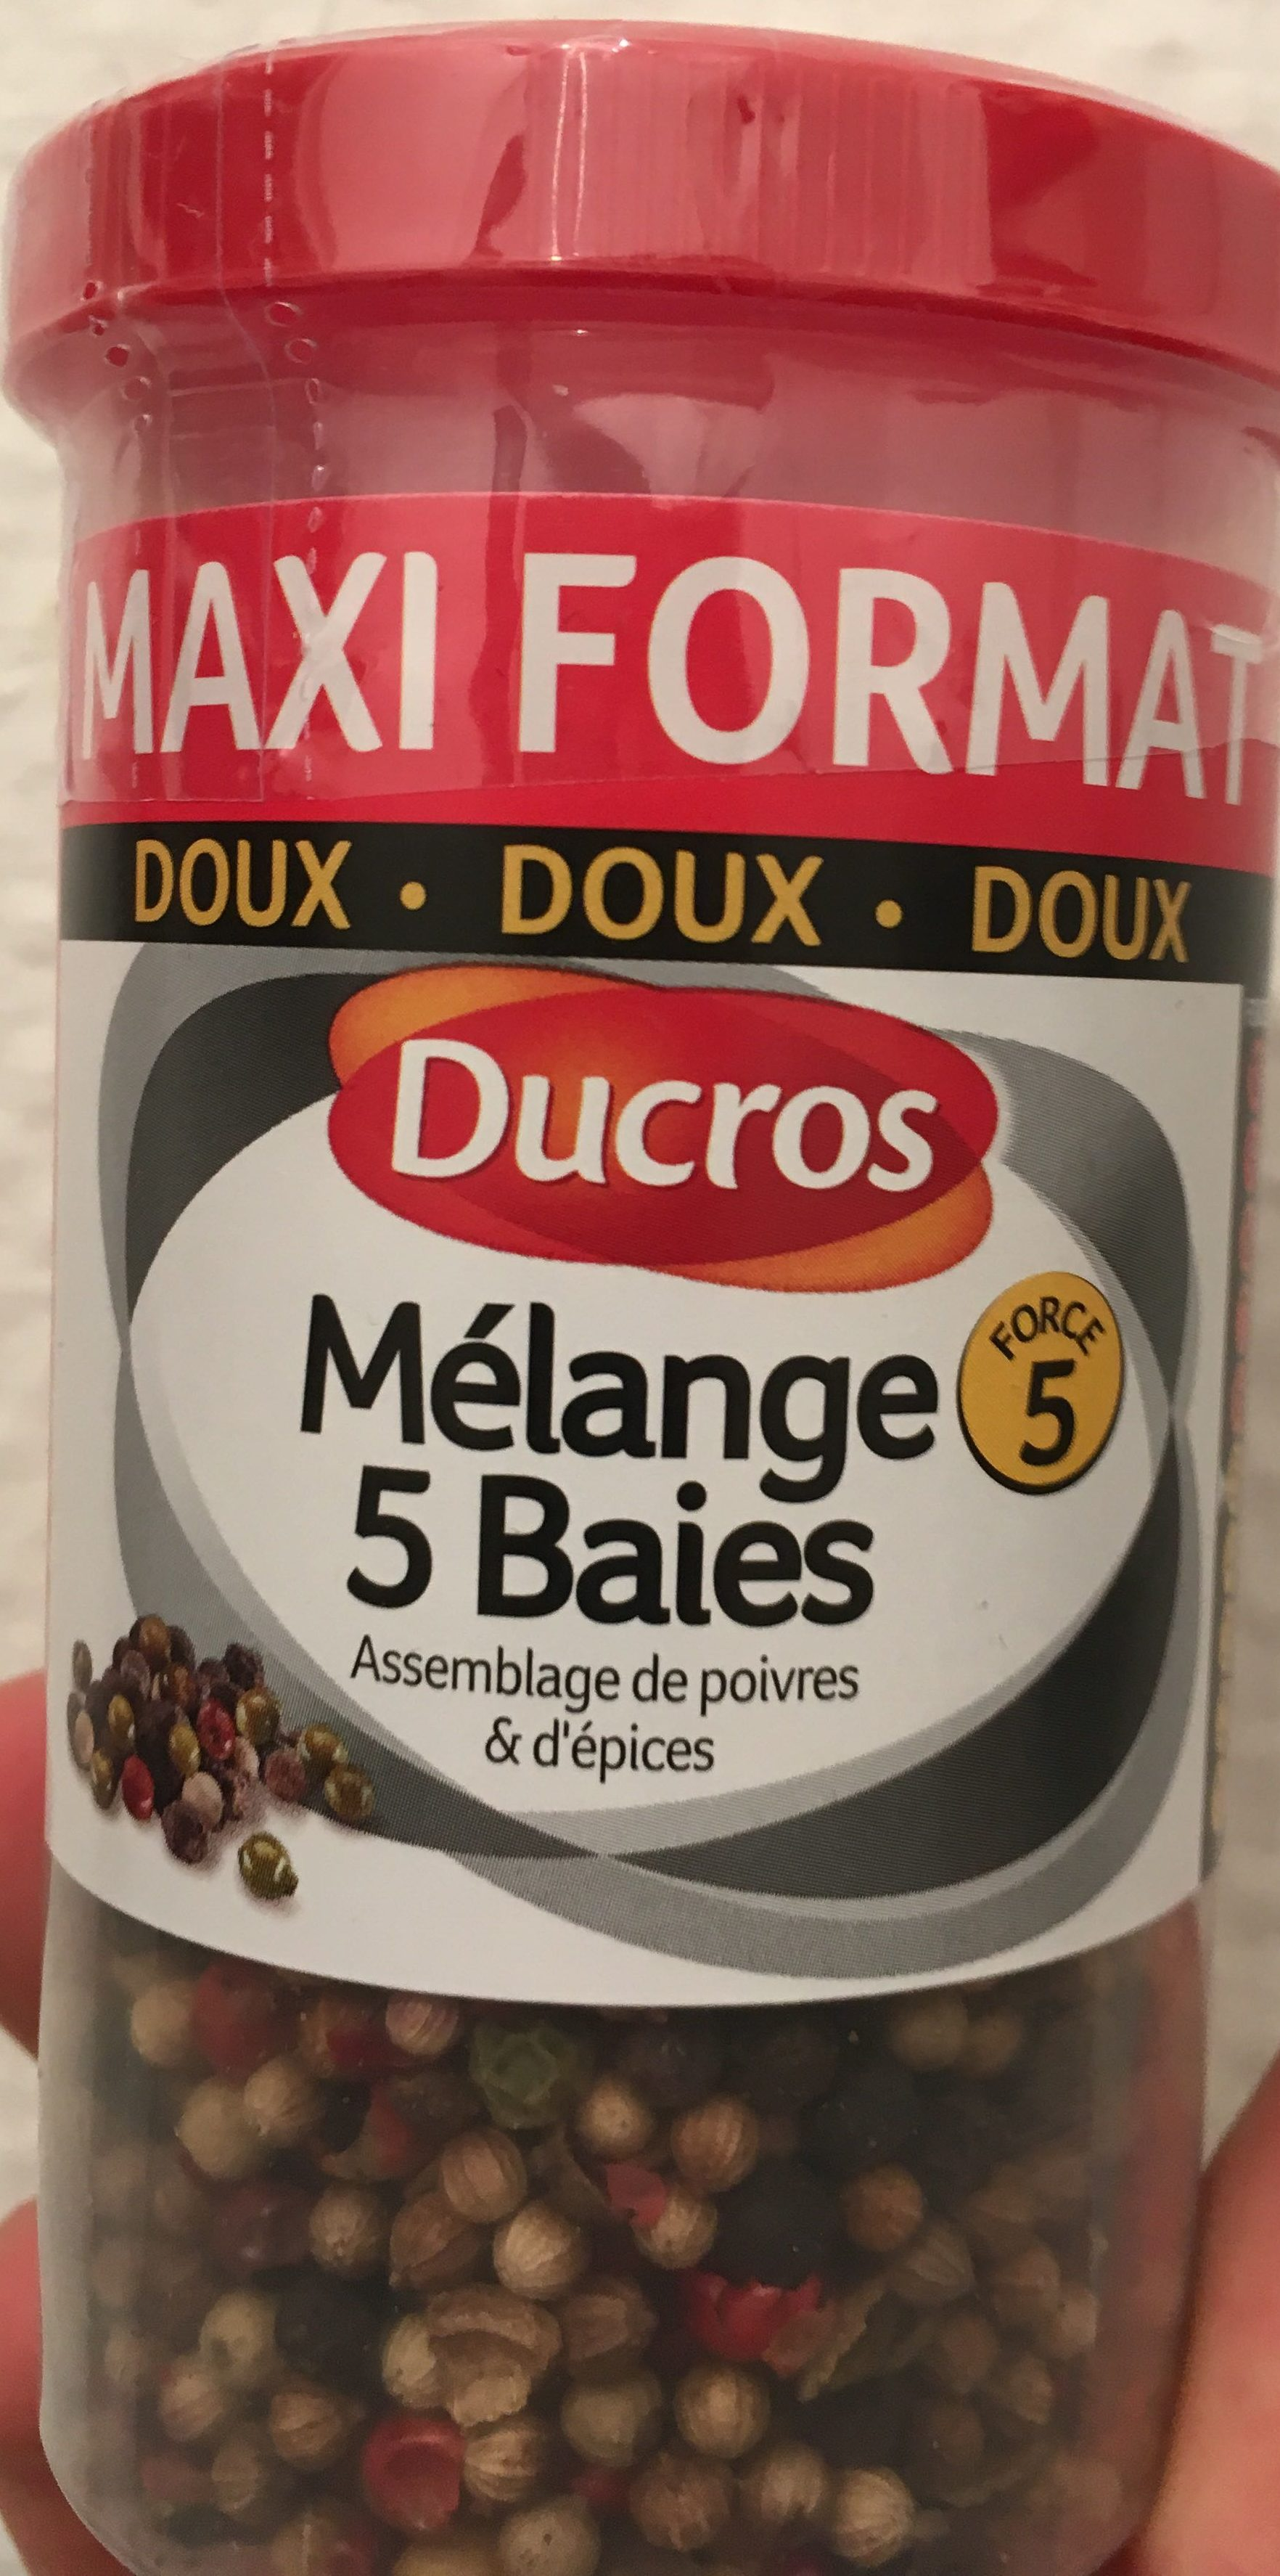 Mélange 5 baies (maxi format) - Producto